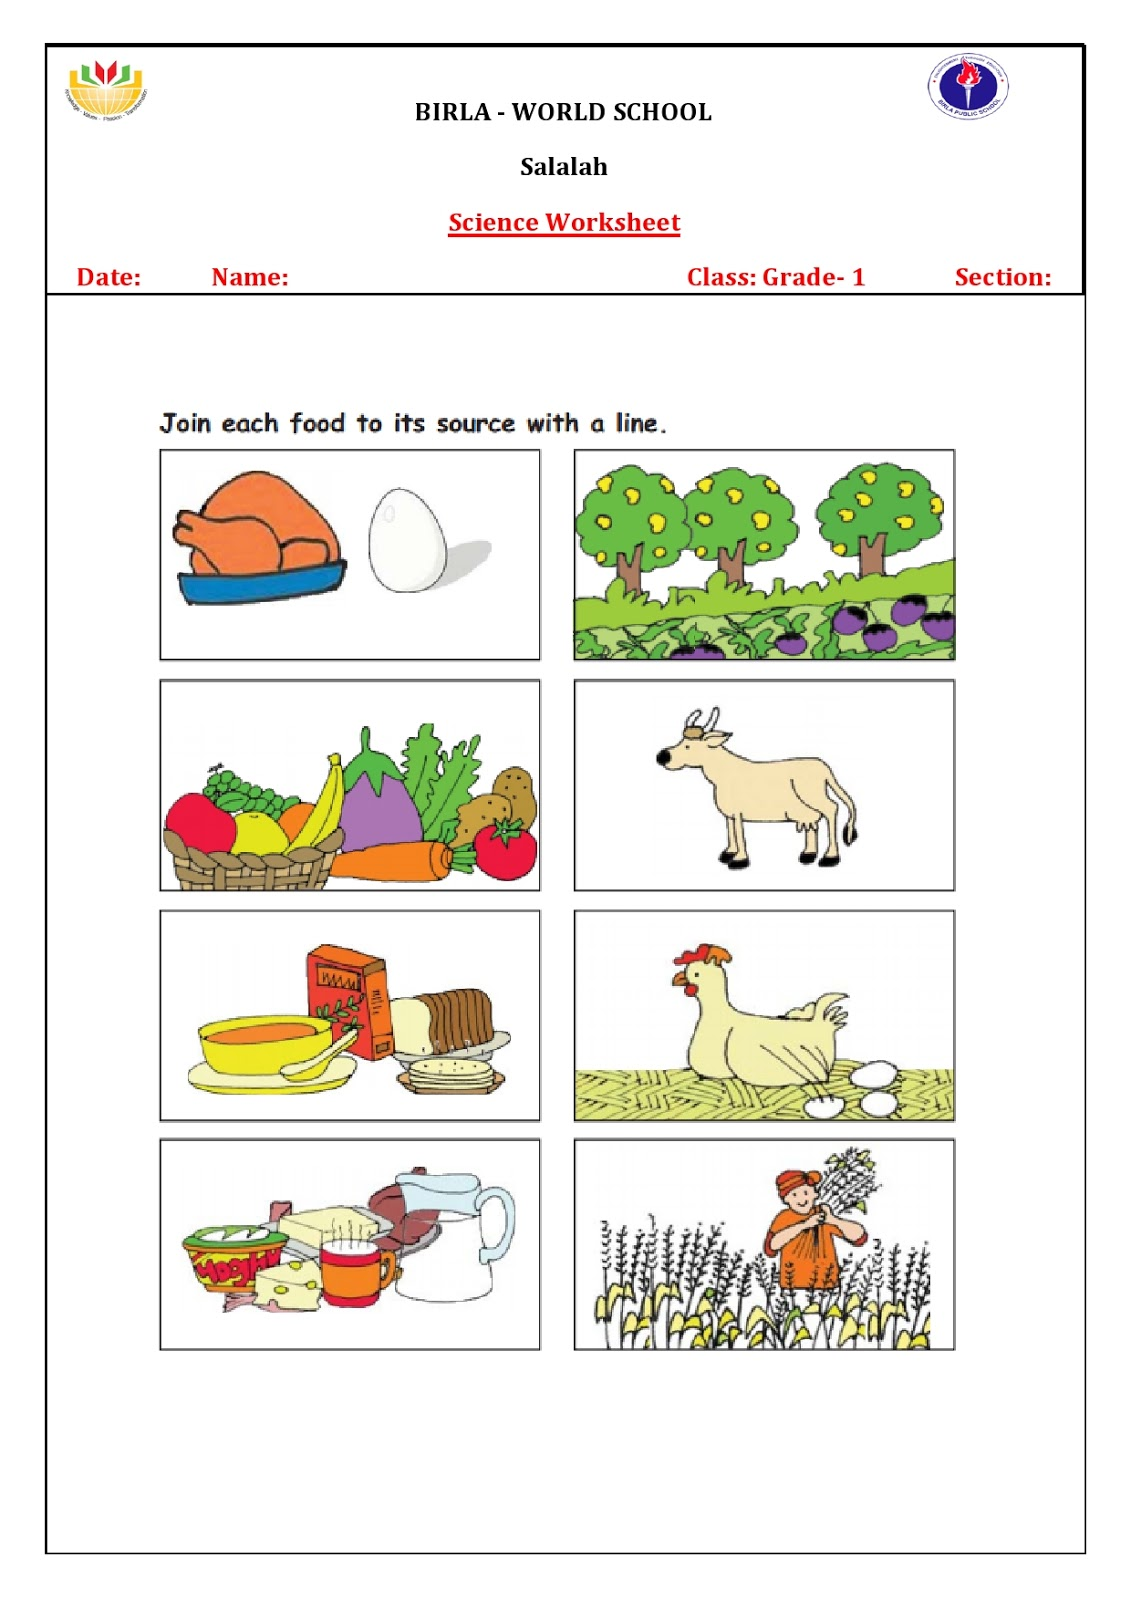 Birla World School Oman Homework For Grade 1b And D On 01